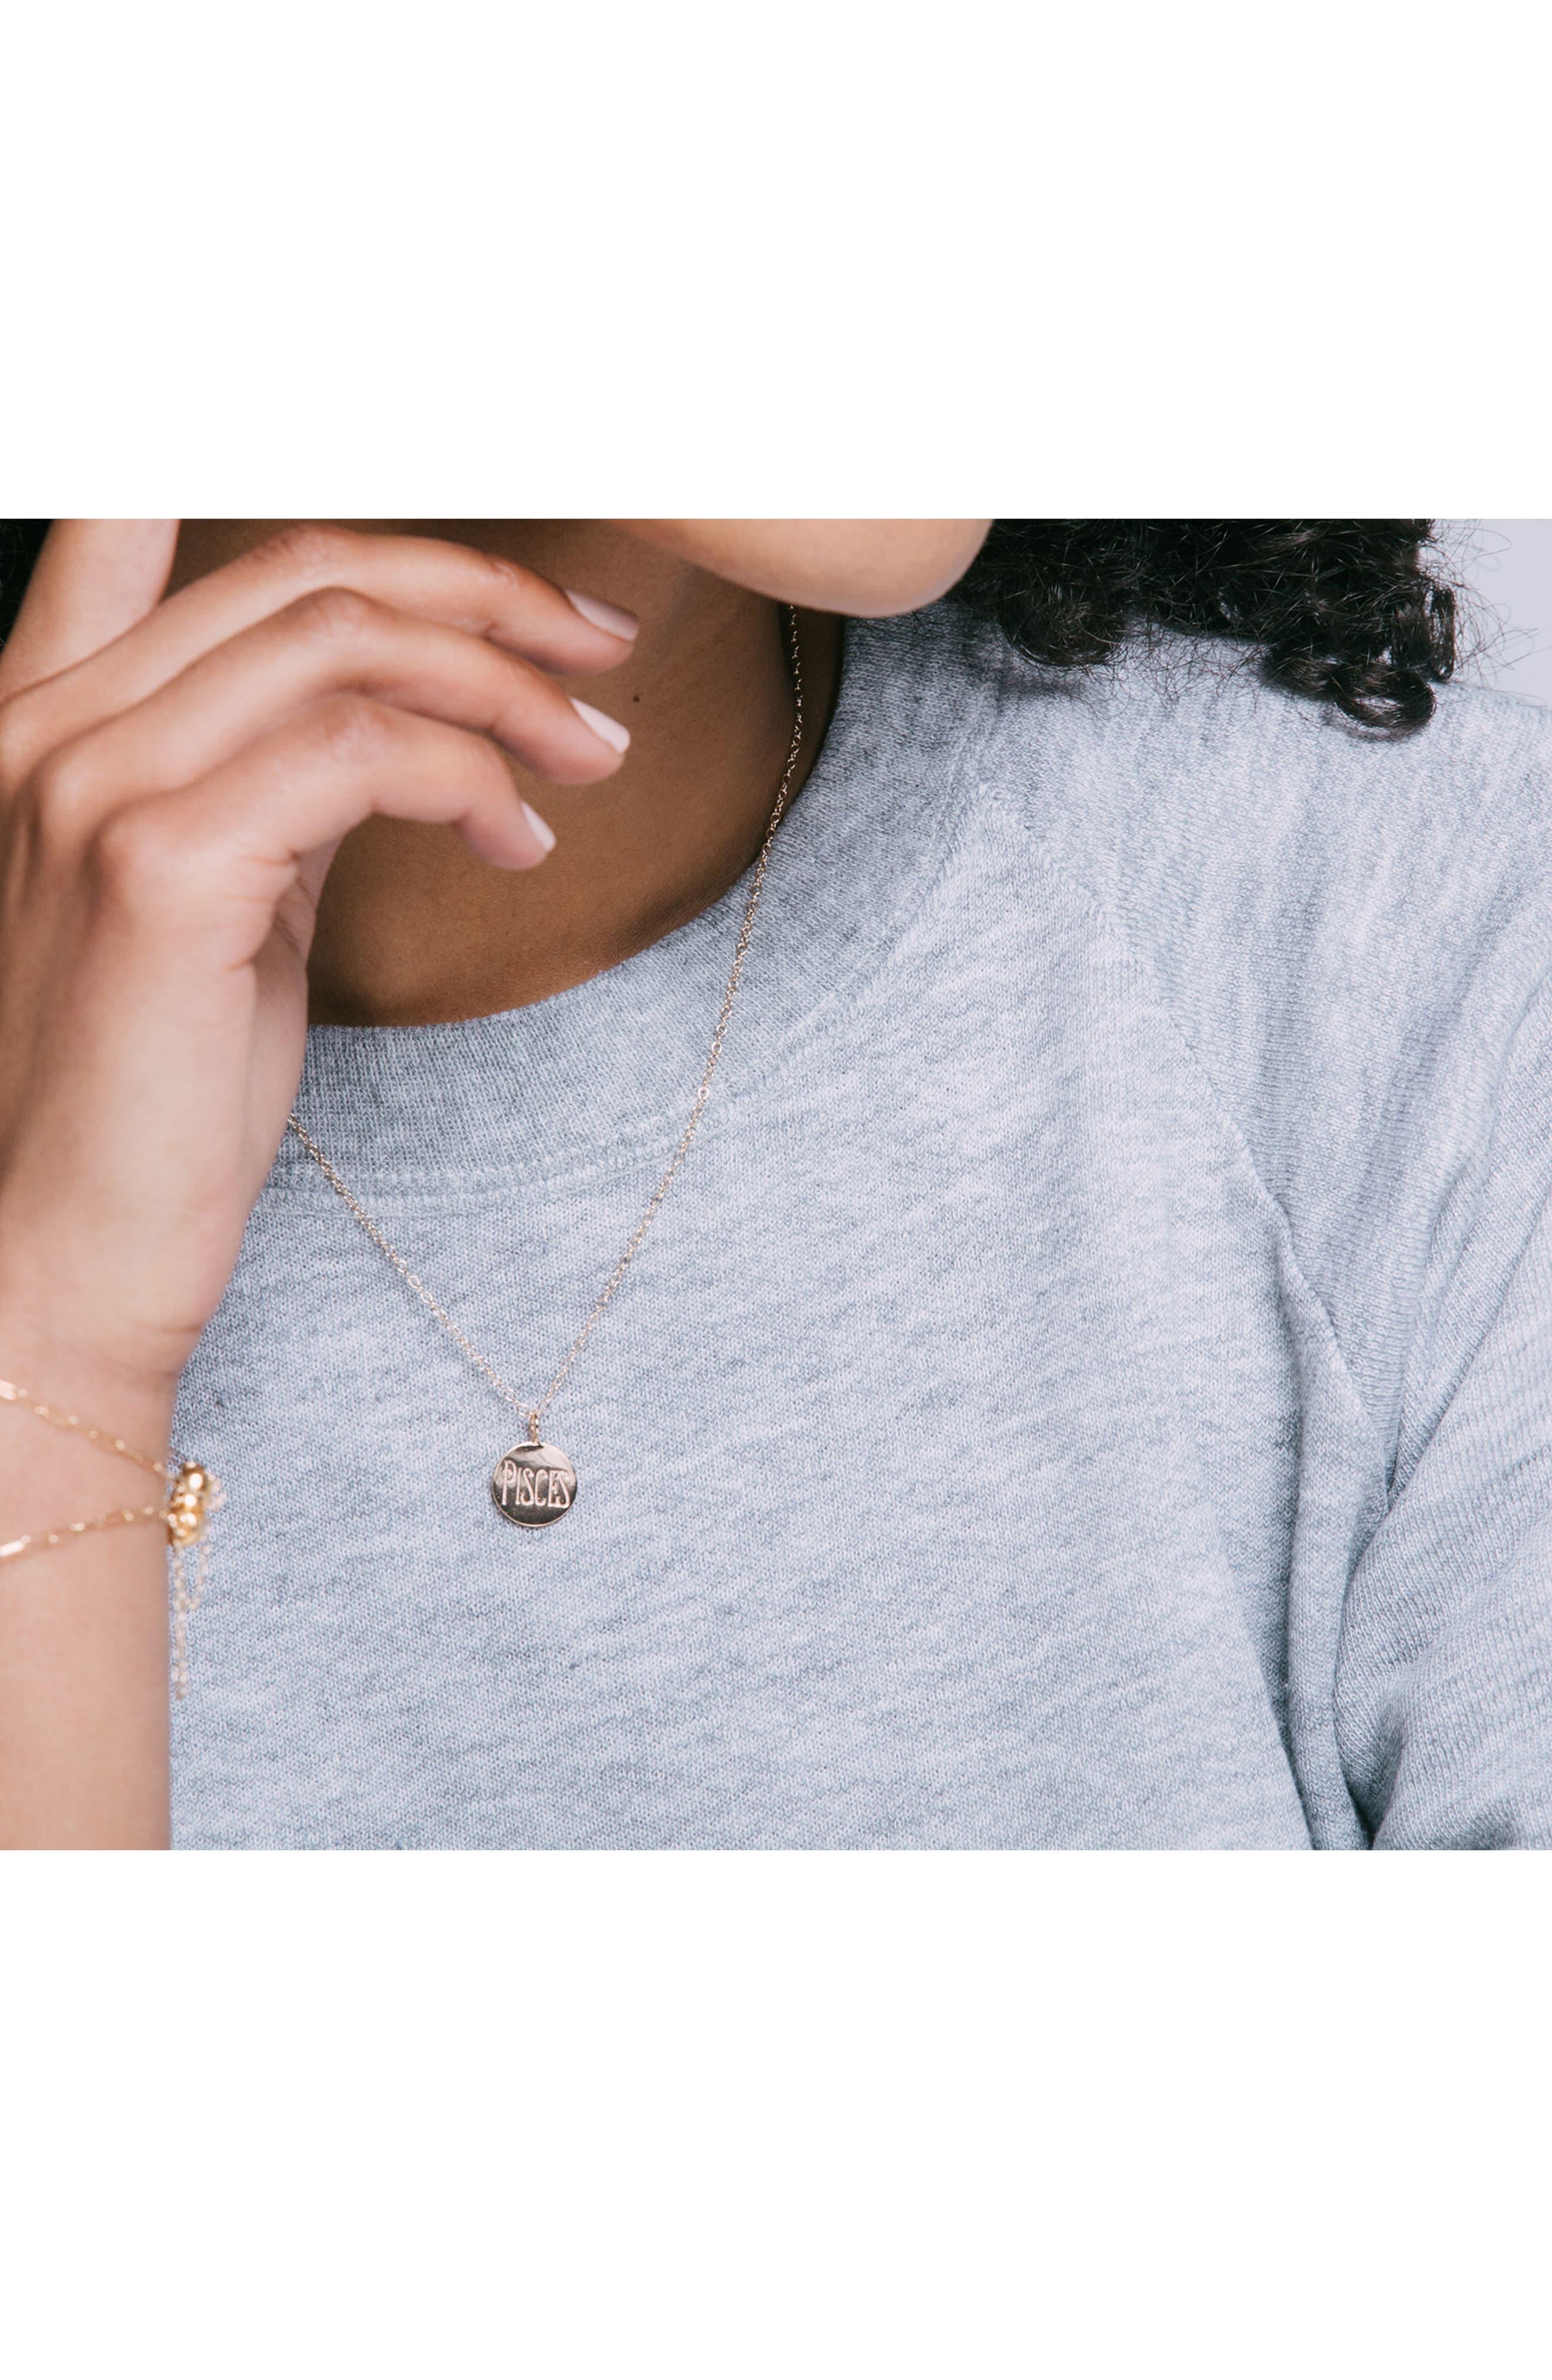 Zodiac Charm Necklace,                             Alternate thumbnail 2, color,                             Gemini - Gold